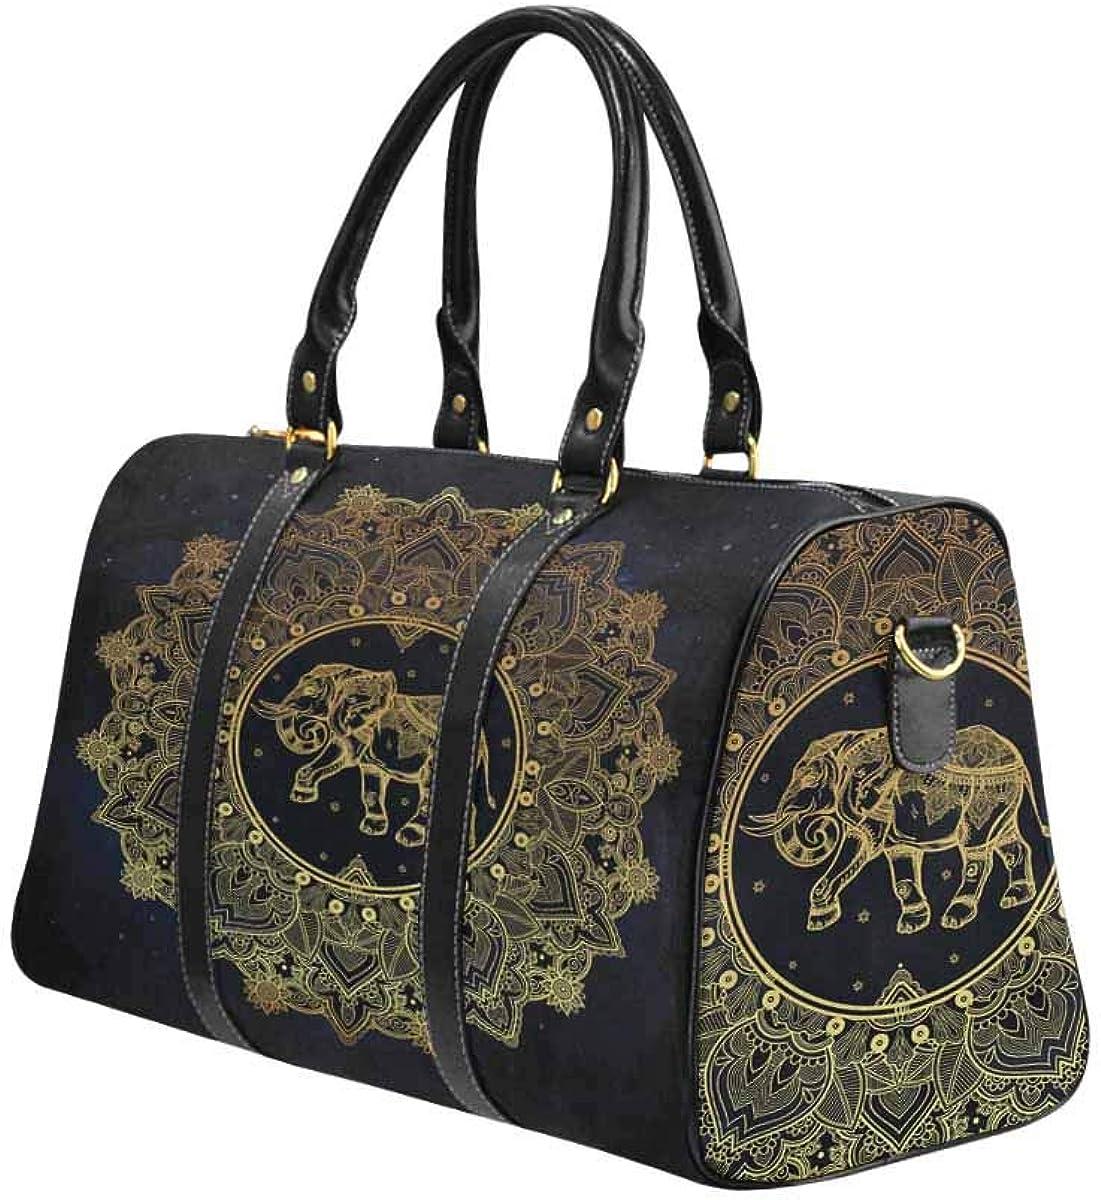 INTERESTPRINT Weekender Bag Overnight Carry-on Tote Duffel Bag Paisley Mandala with Elephant Inside